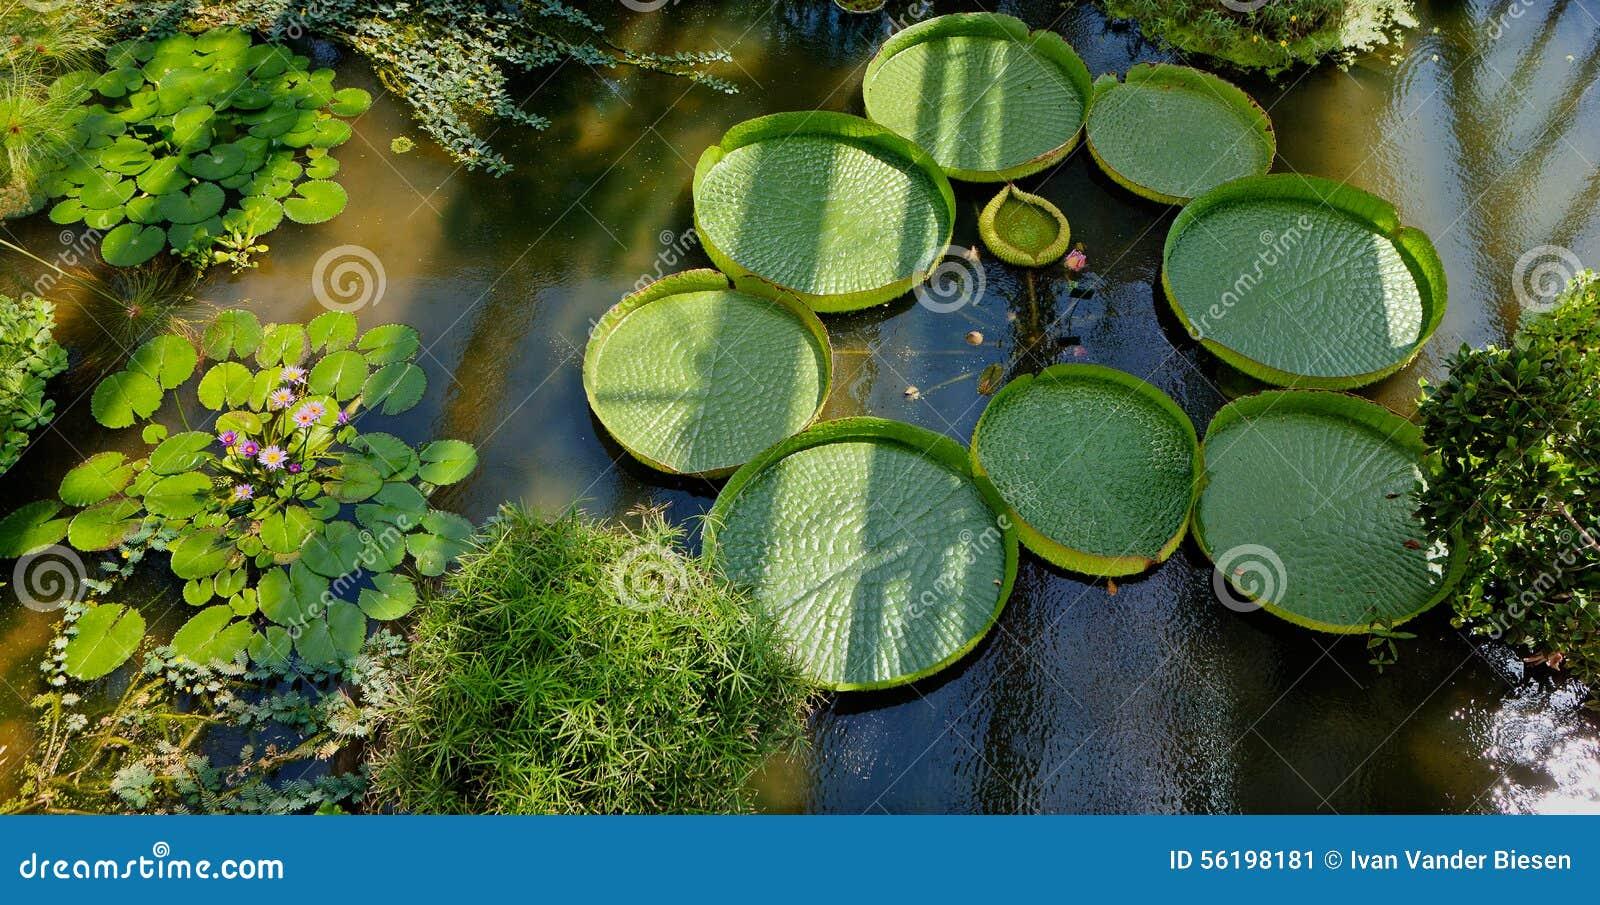 Seerose-botanischer Garten, Padua, Italien Stockbild